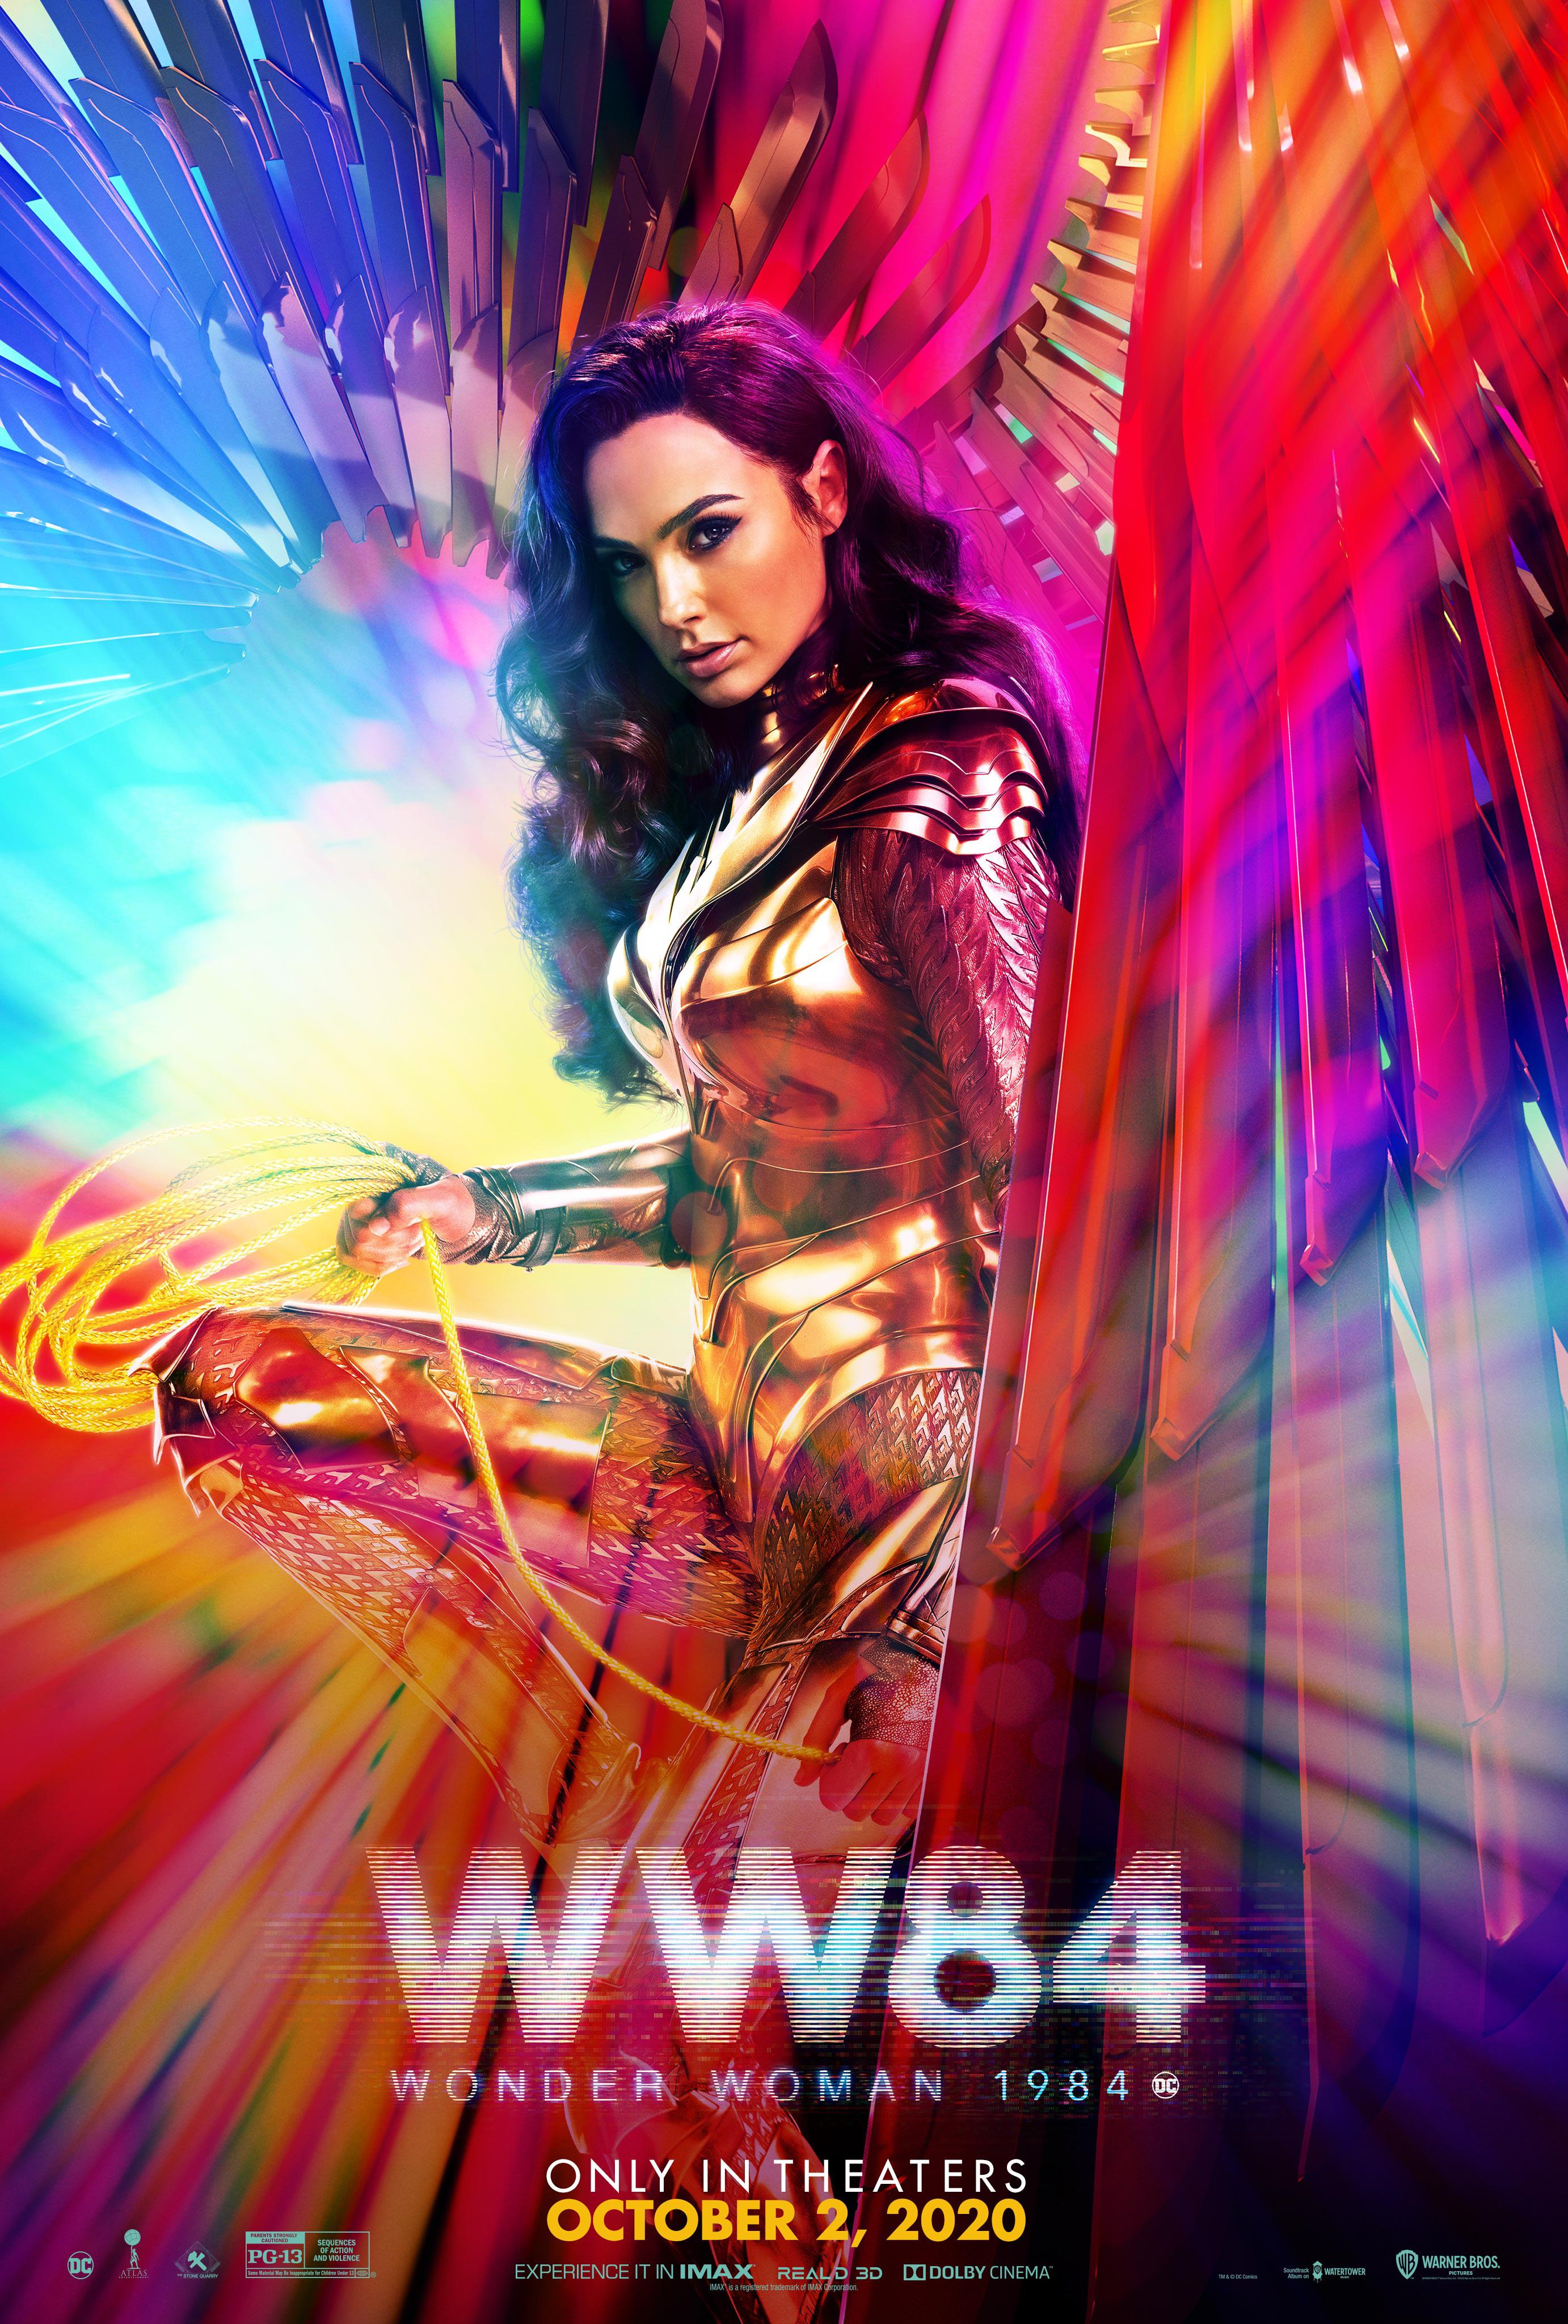 Gal Gadot Wonder Woman 1984 Poster Sports New October Release Date | Cosmic  Book News